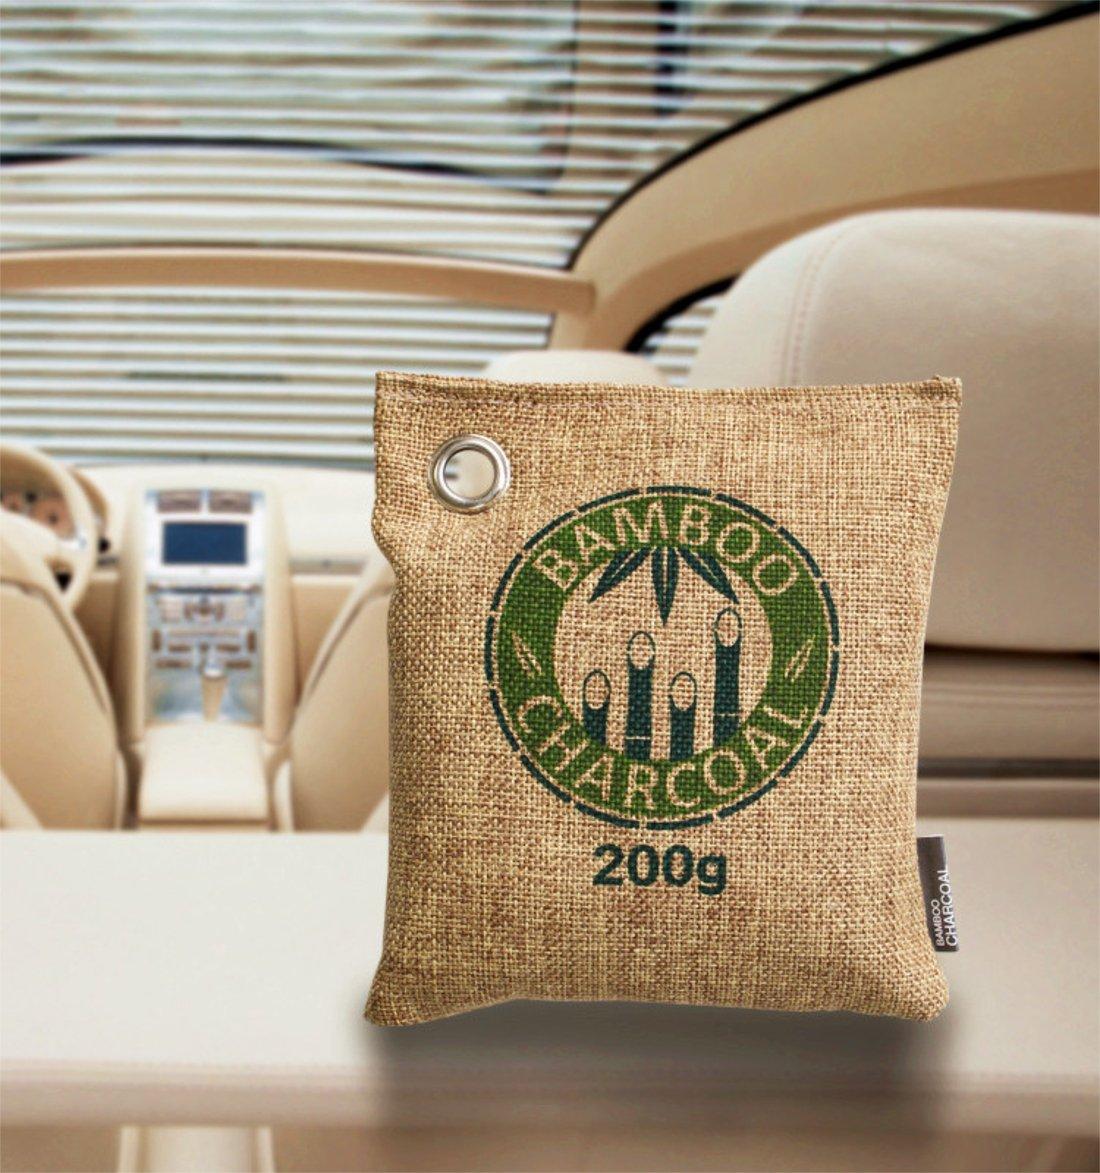 d62844702b9d Clarastar Bamboo Charcoal Jute Bag for Air Freshener, Fridge Freshener  Deodorizer and Moisture Absorbent (200g, Brown): Amazon.in: Home & Kitchen